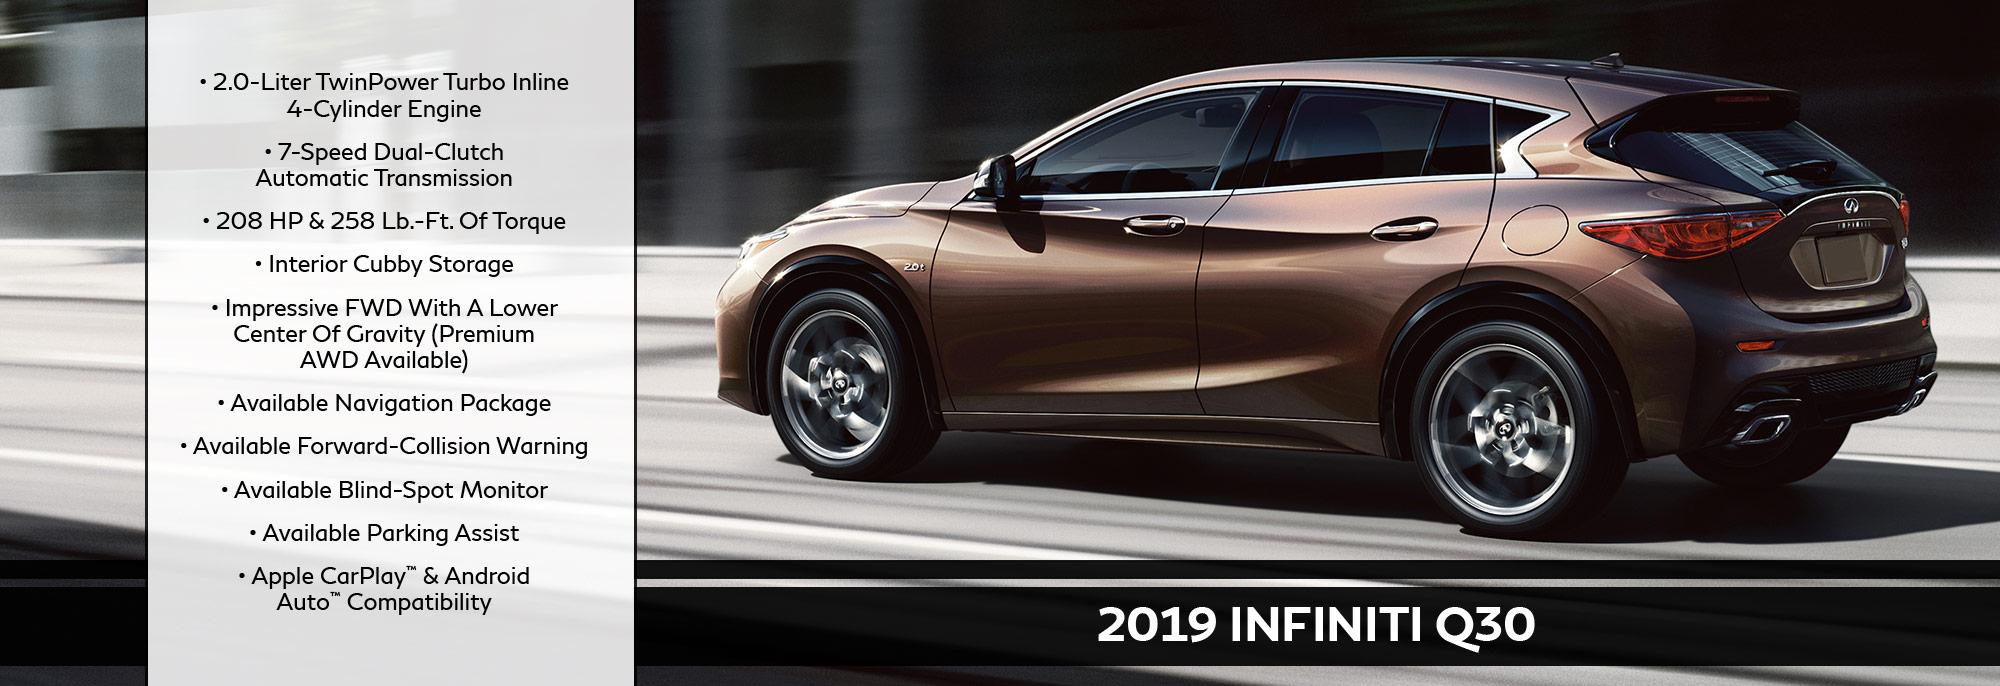 New 2019 INFINITI Q30 Offer